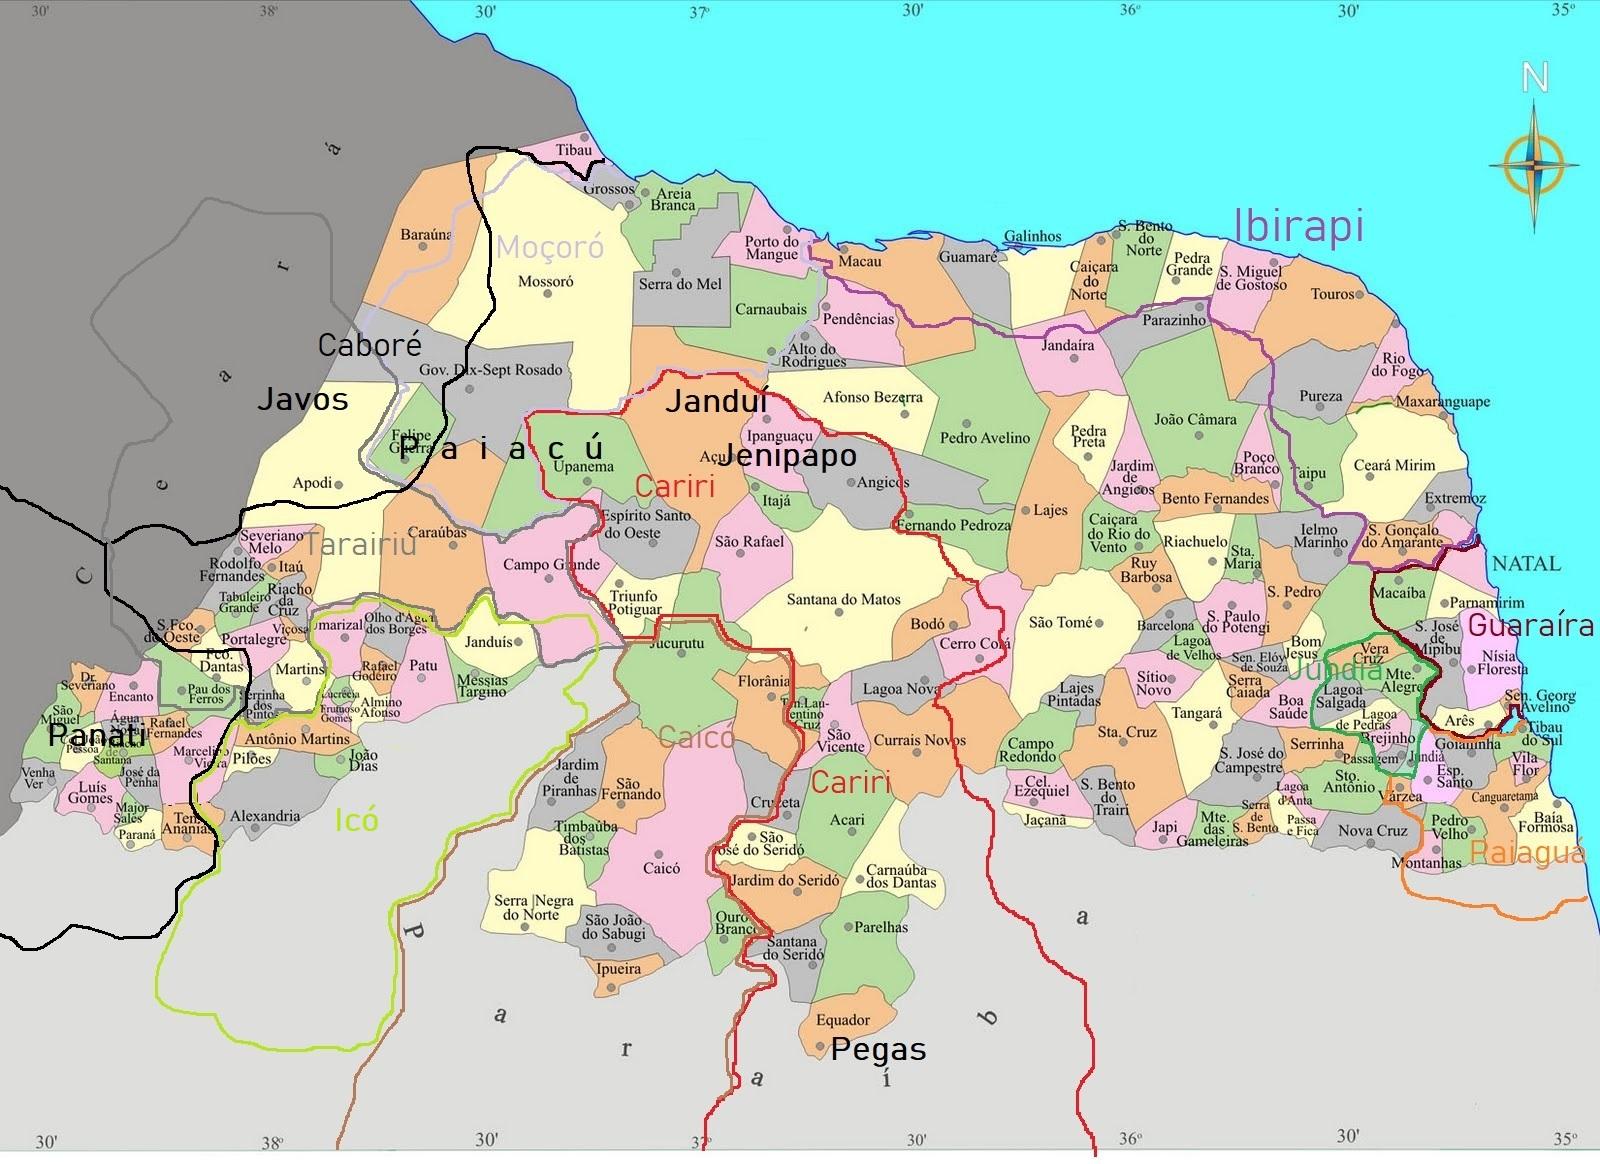 mapa-municipios-rio-grande-do-norte.jpg